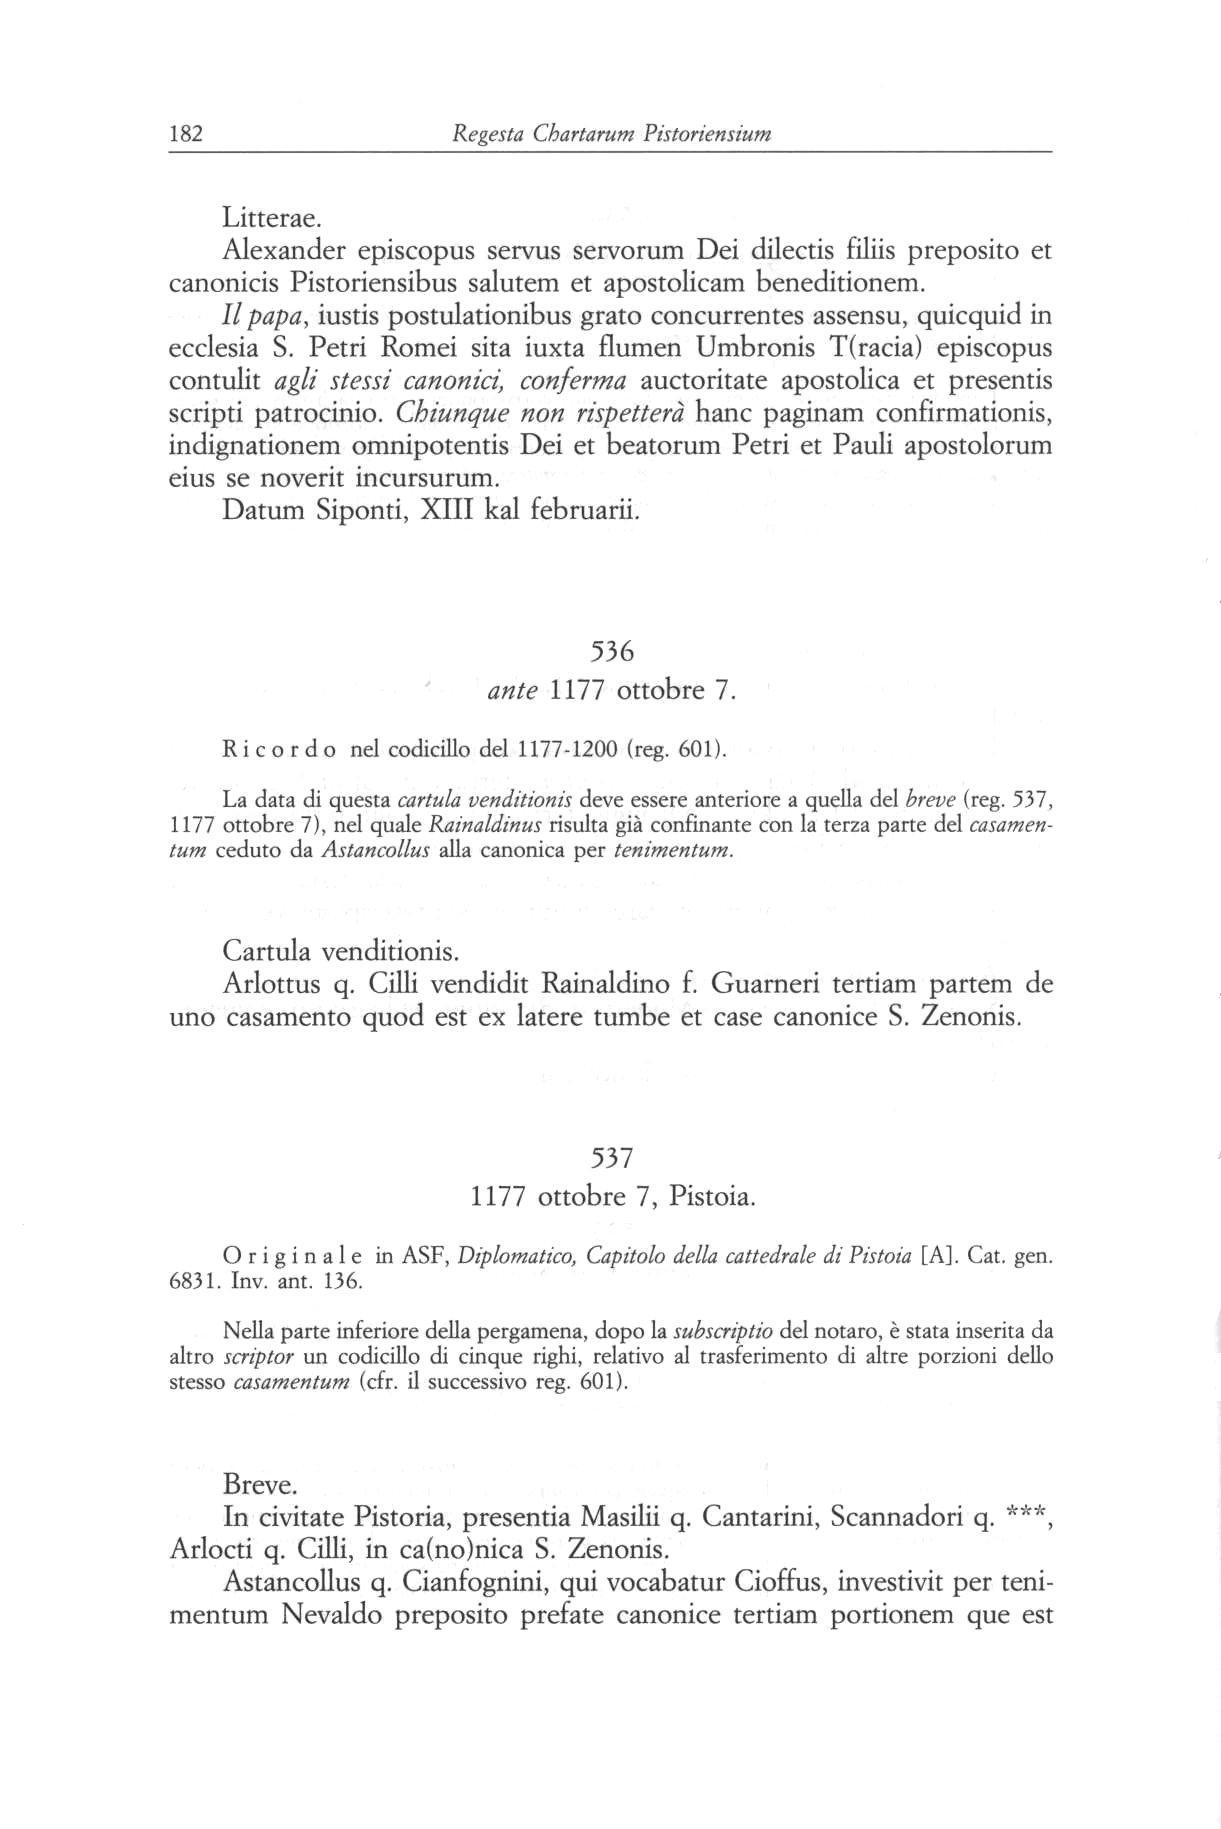 Canonica S. Zenone XII 0182.jpg